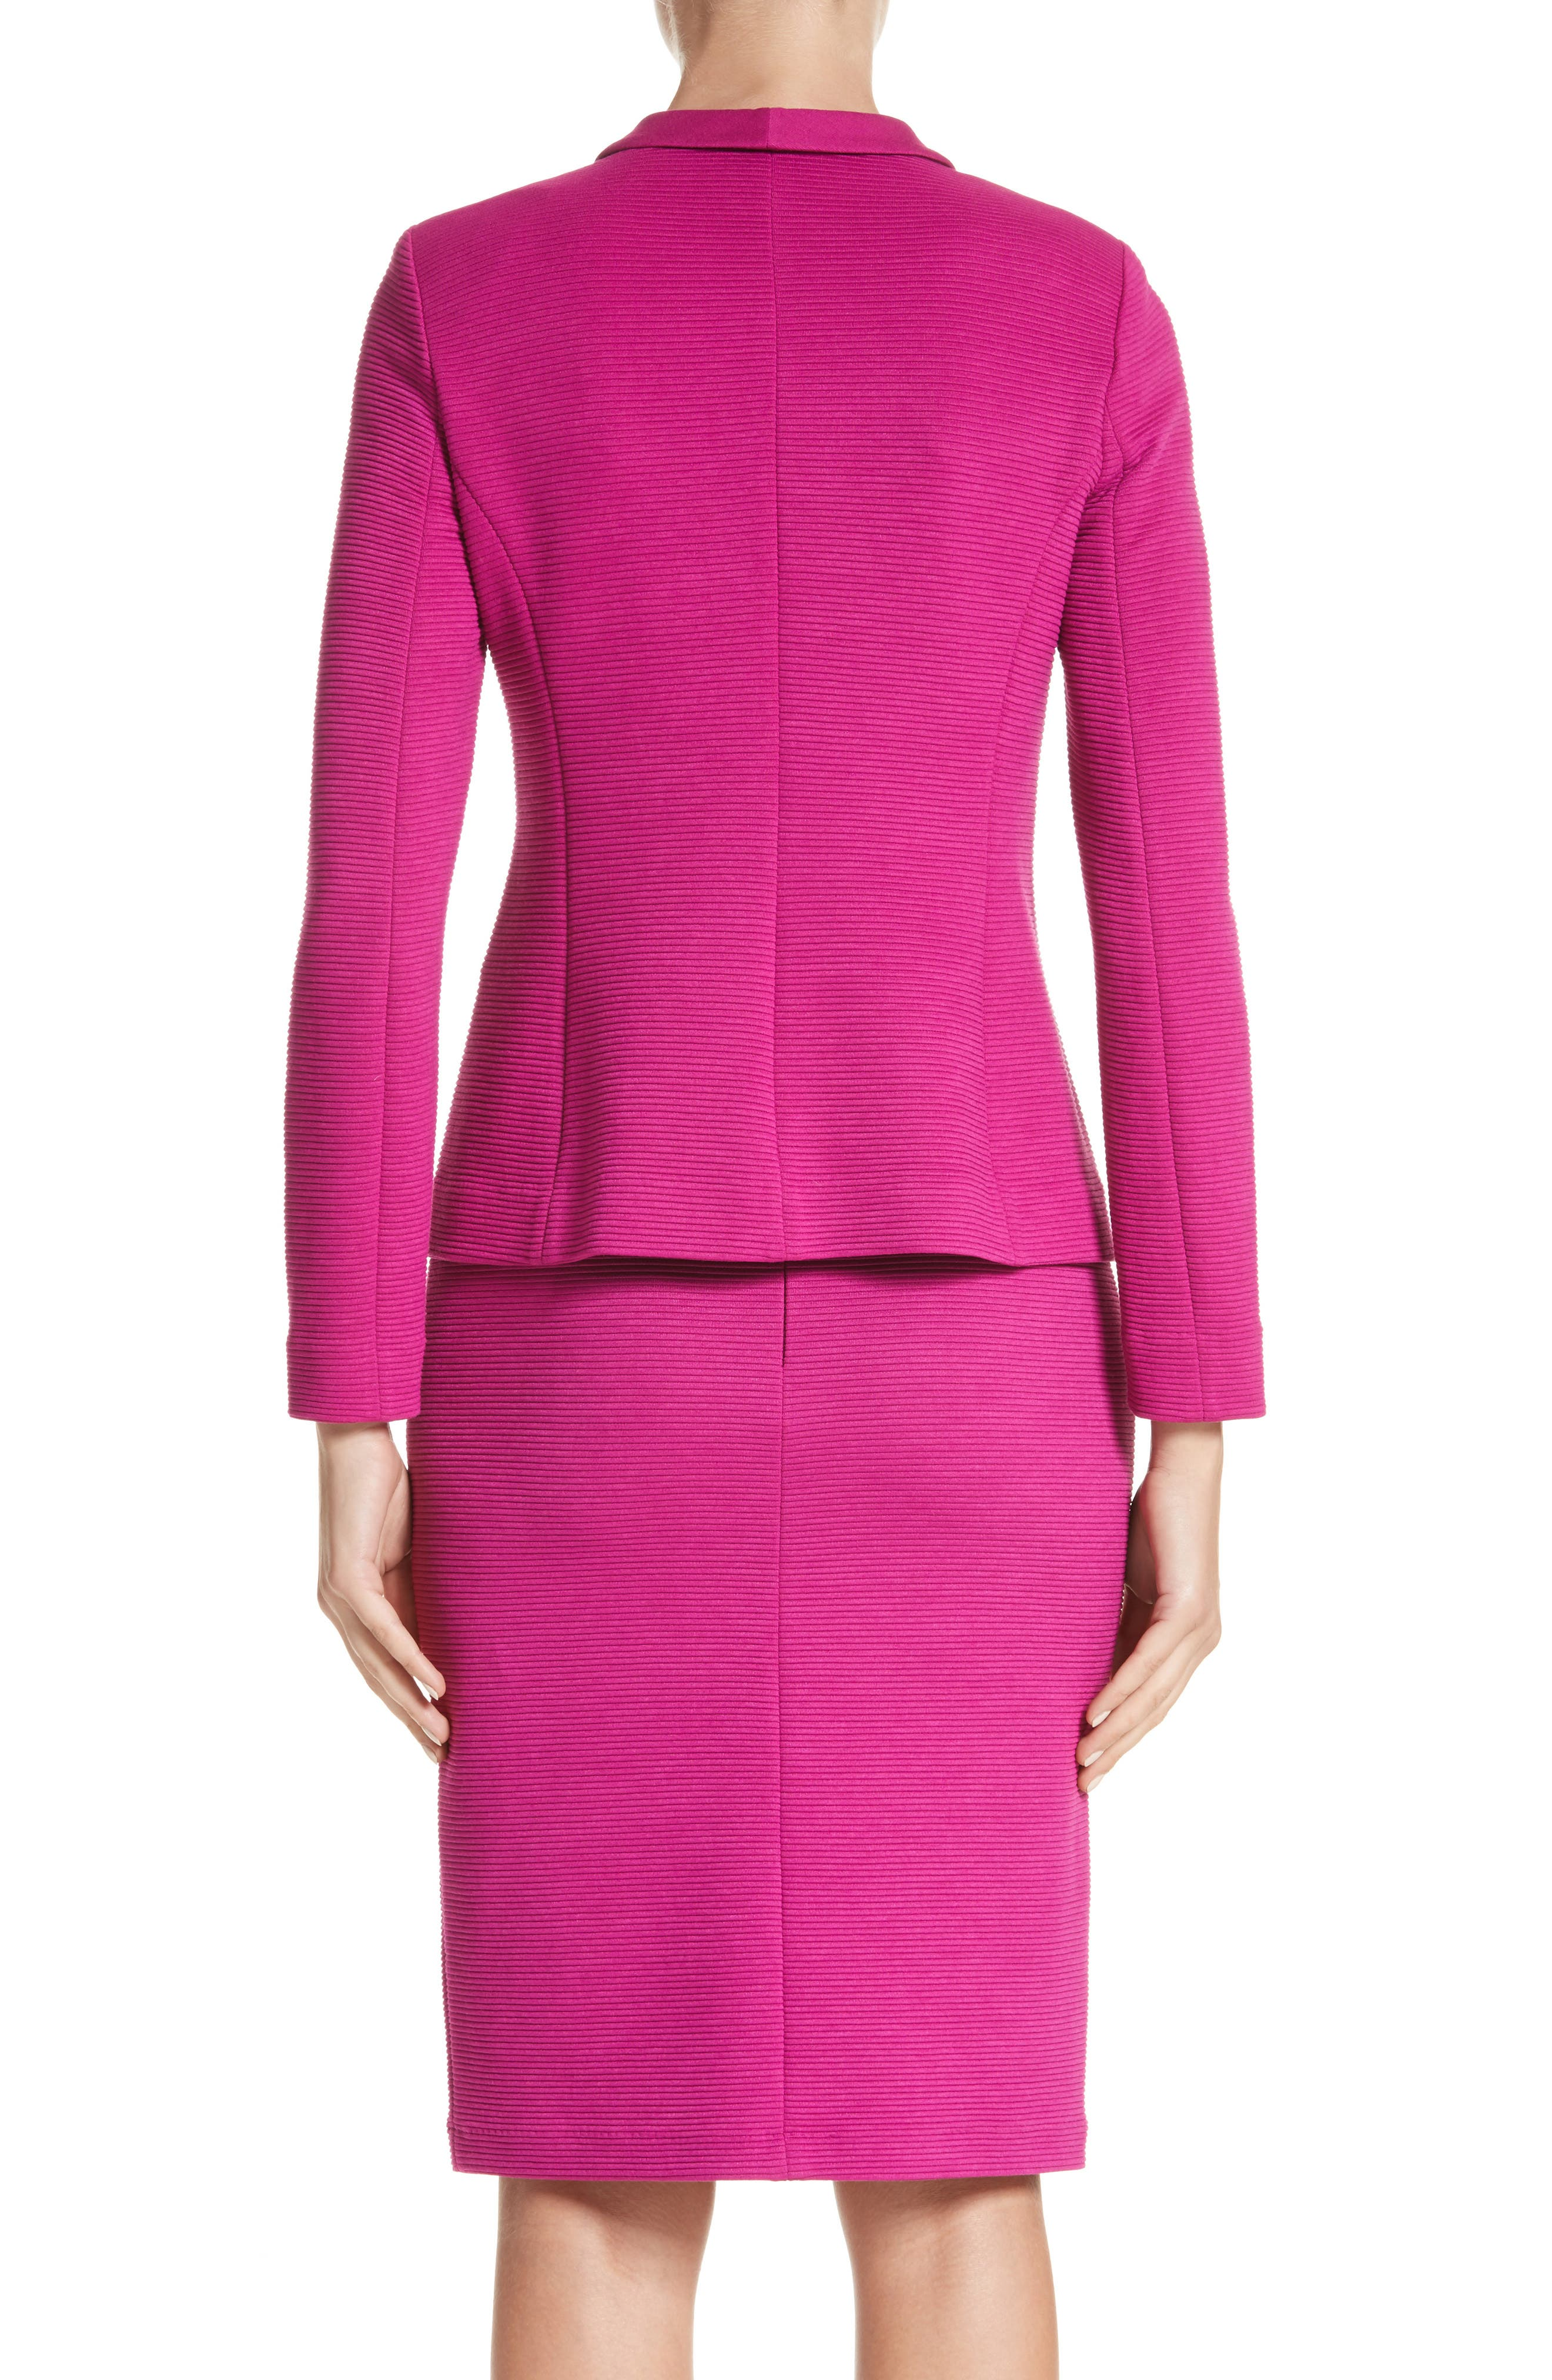 Ottoman Jersey Jacket,                             Alternate thumbnail 2, color,                             001